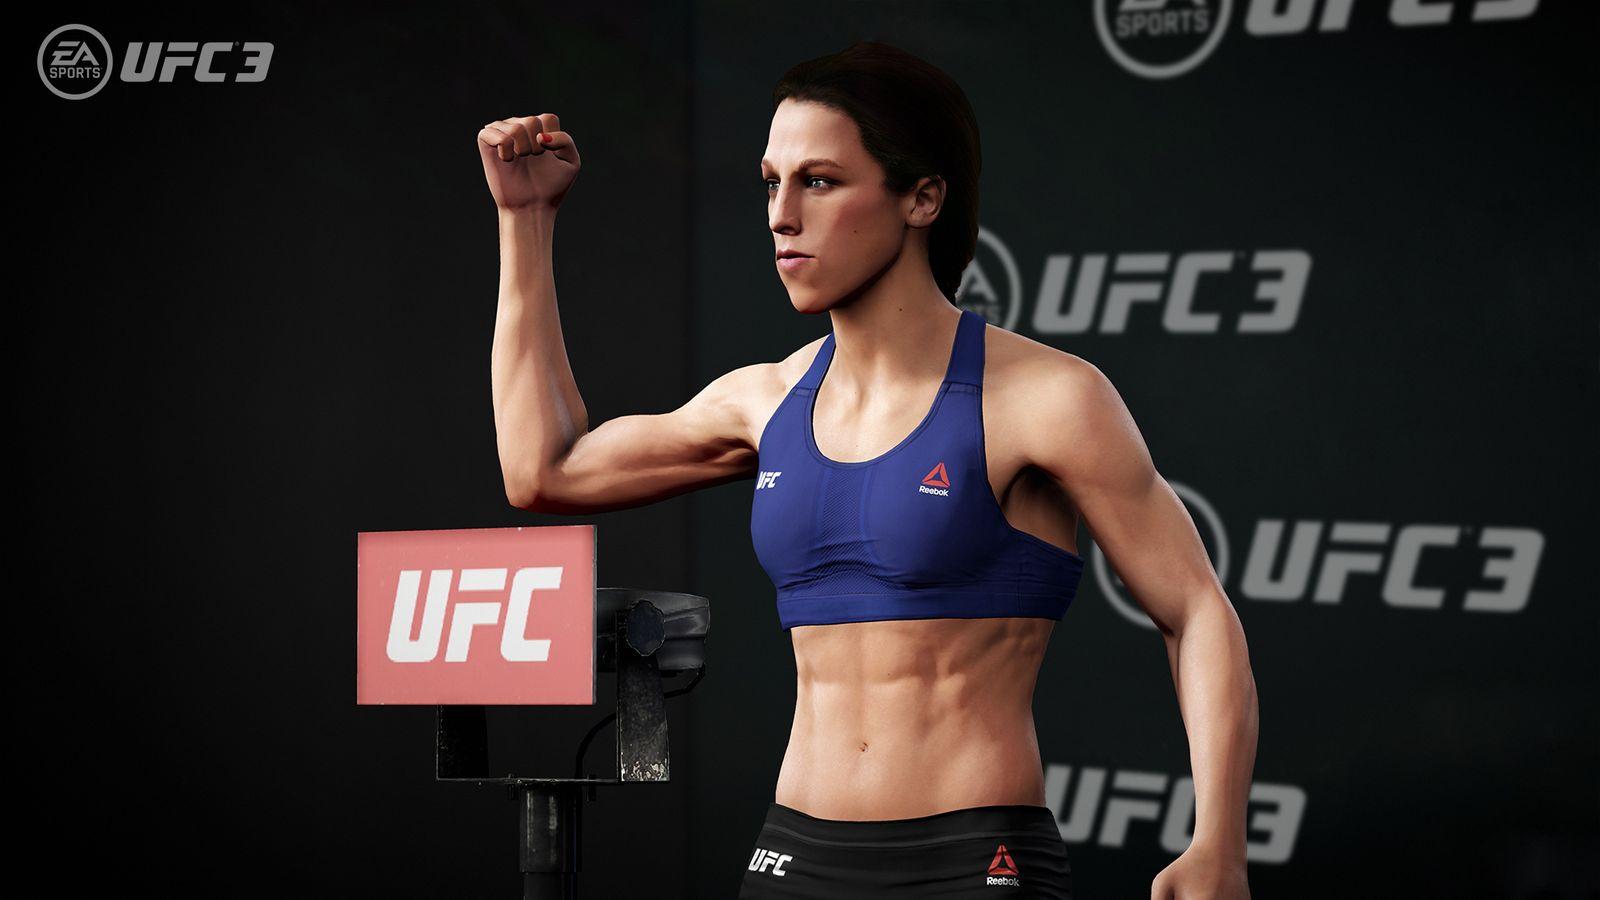 UFC3_EA Sports